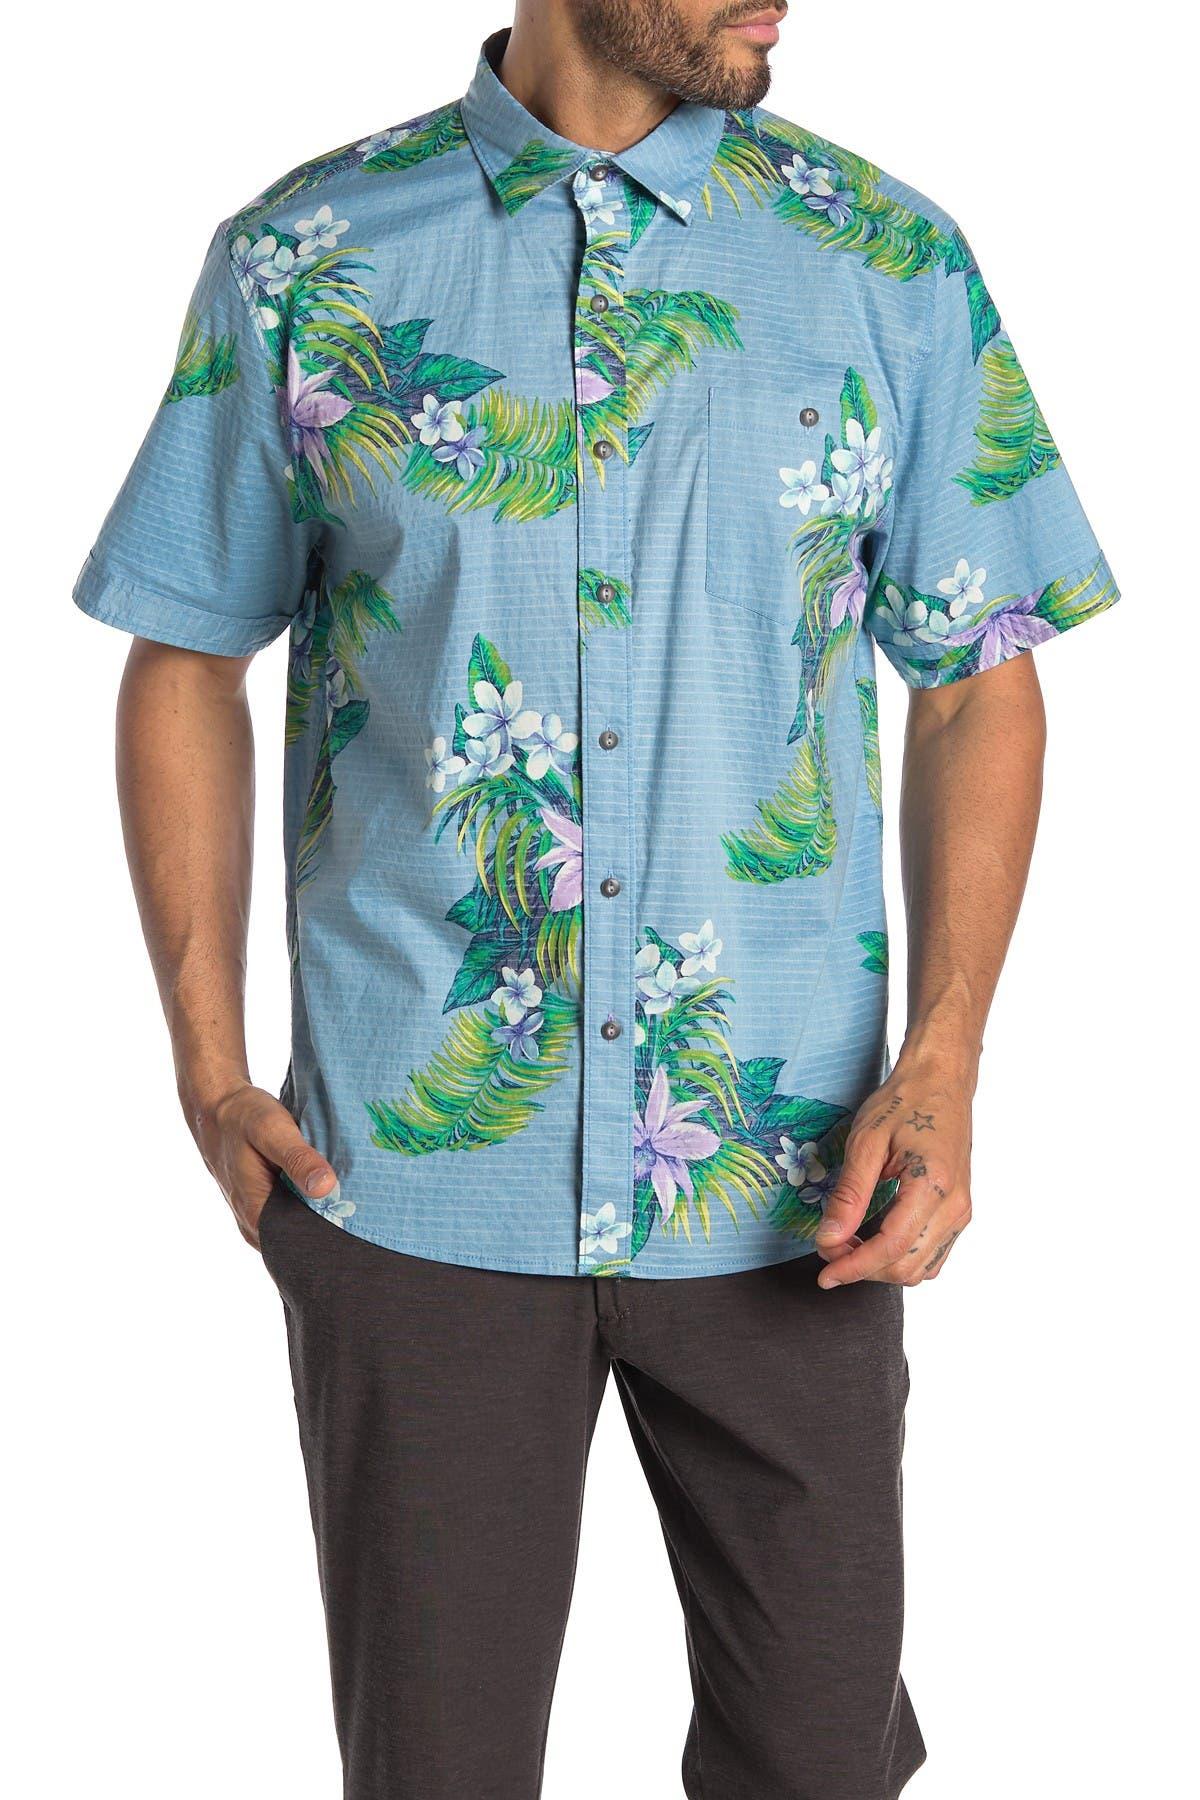 Image of Tommy Bahama Avenza Blooms Short Sleeve Tropical Floral Print Hawaiian Shirt